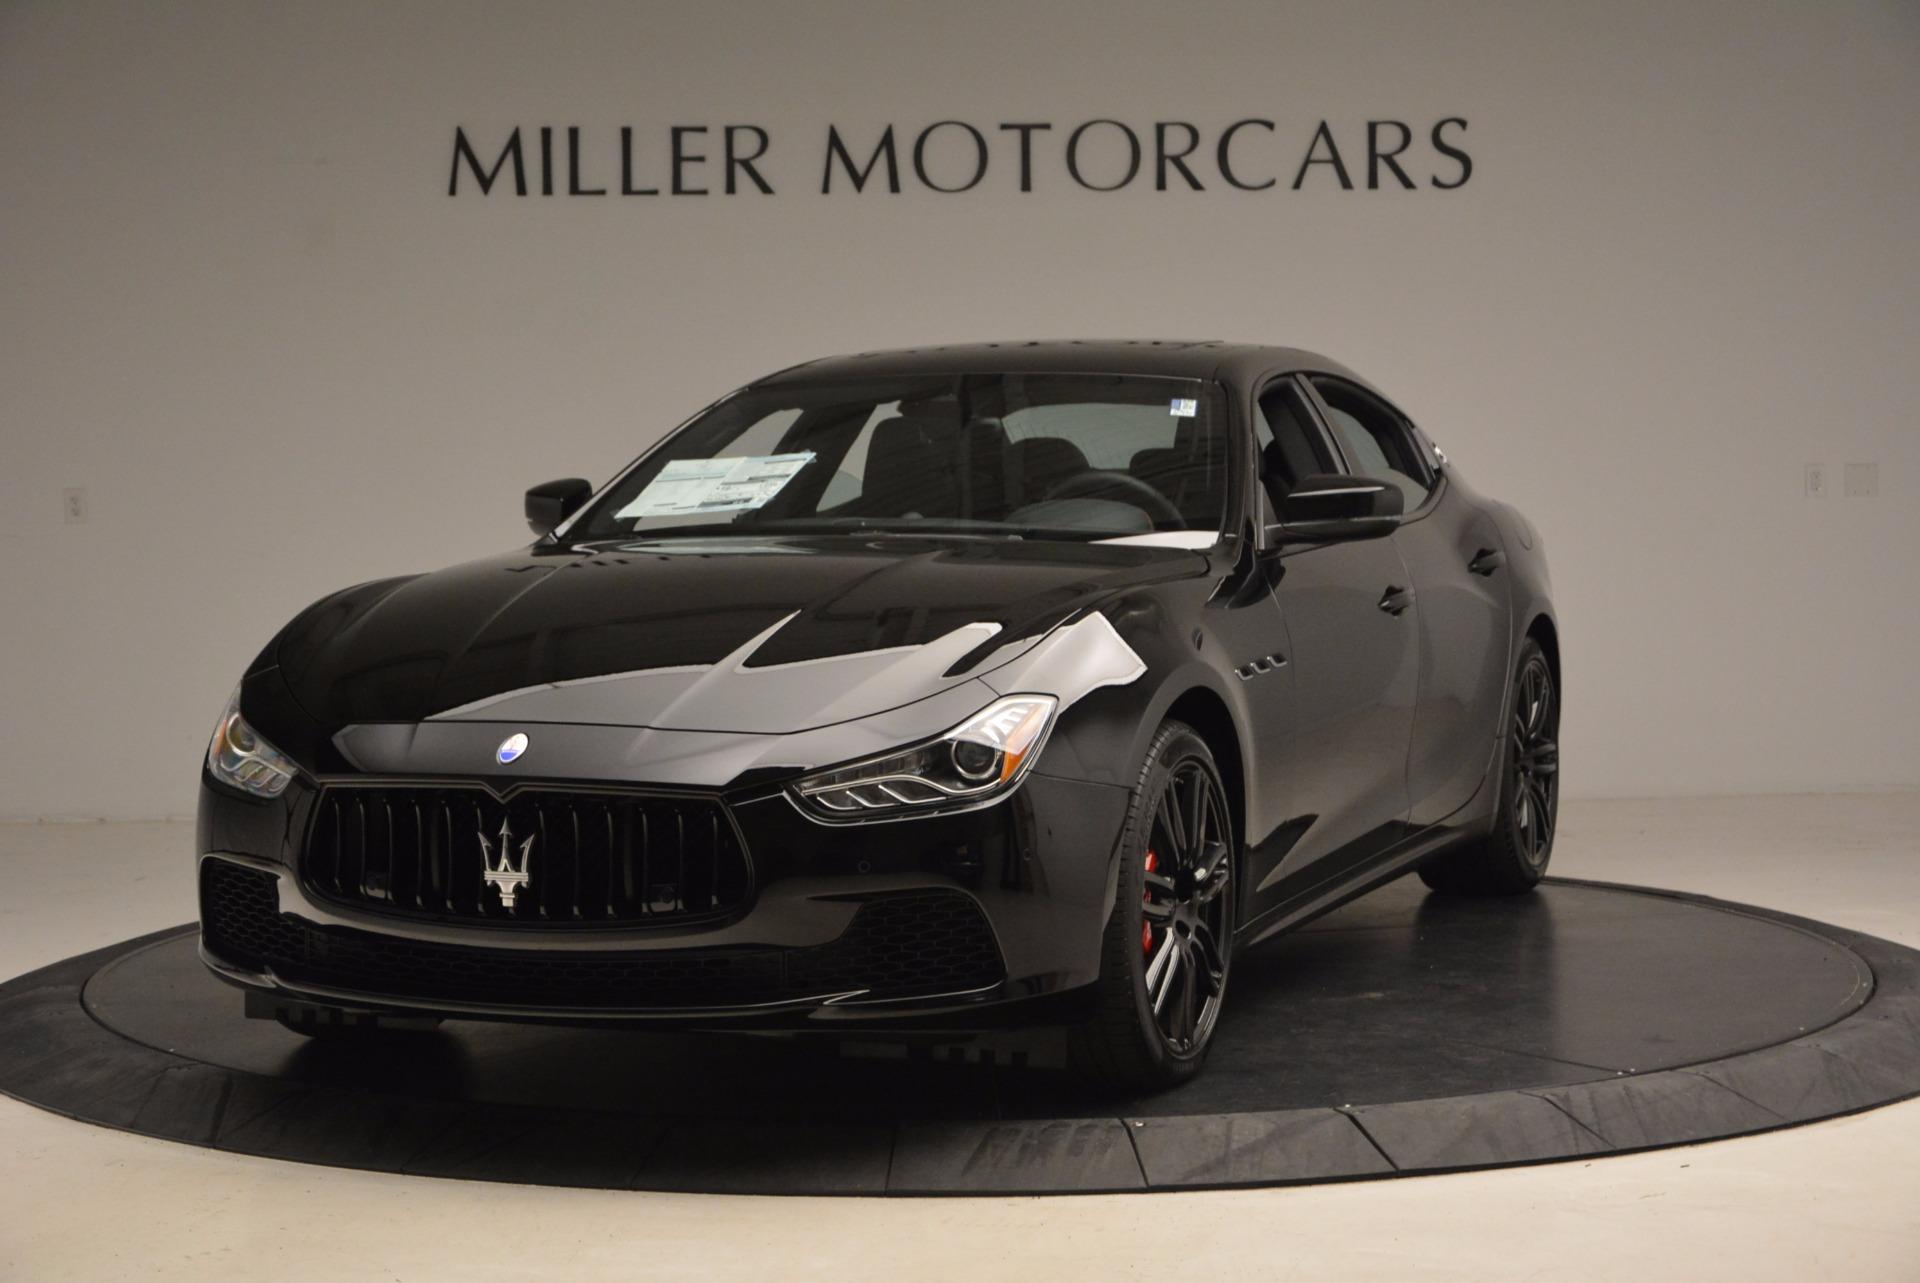 New 2017 Maserati Ghibli Nerissimo Edition S Q4 for sale Sold at Alfa Romeo of Greenwich in Greenwich CT 06830 1